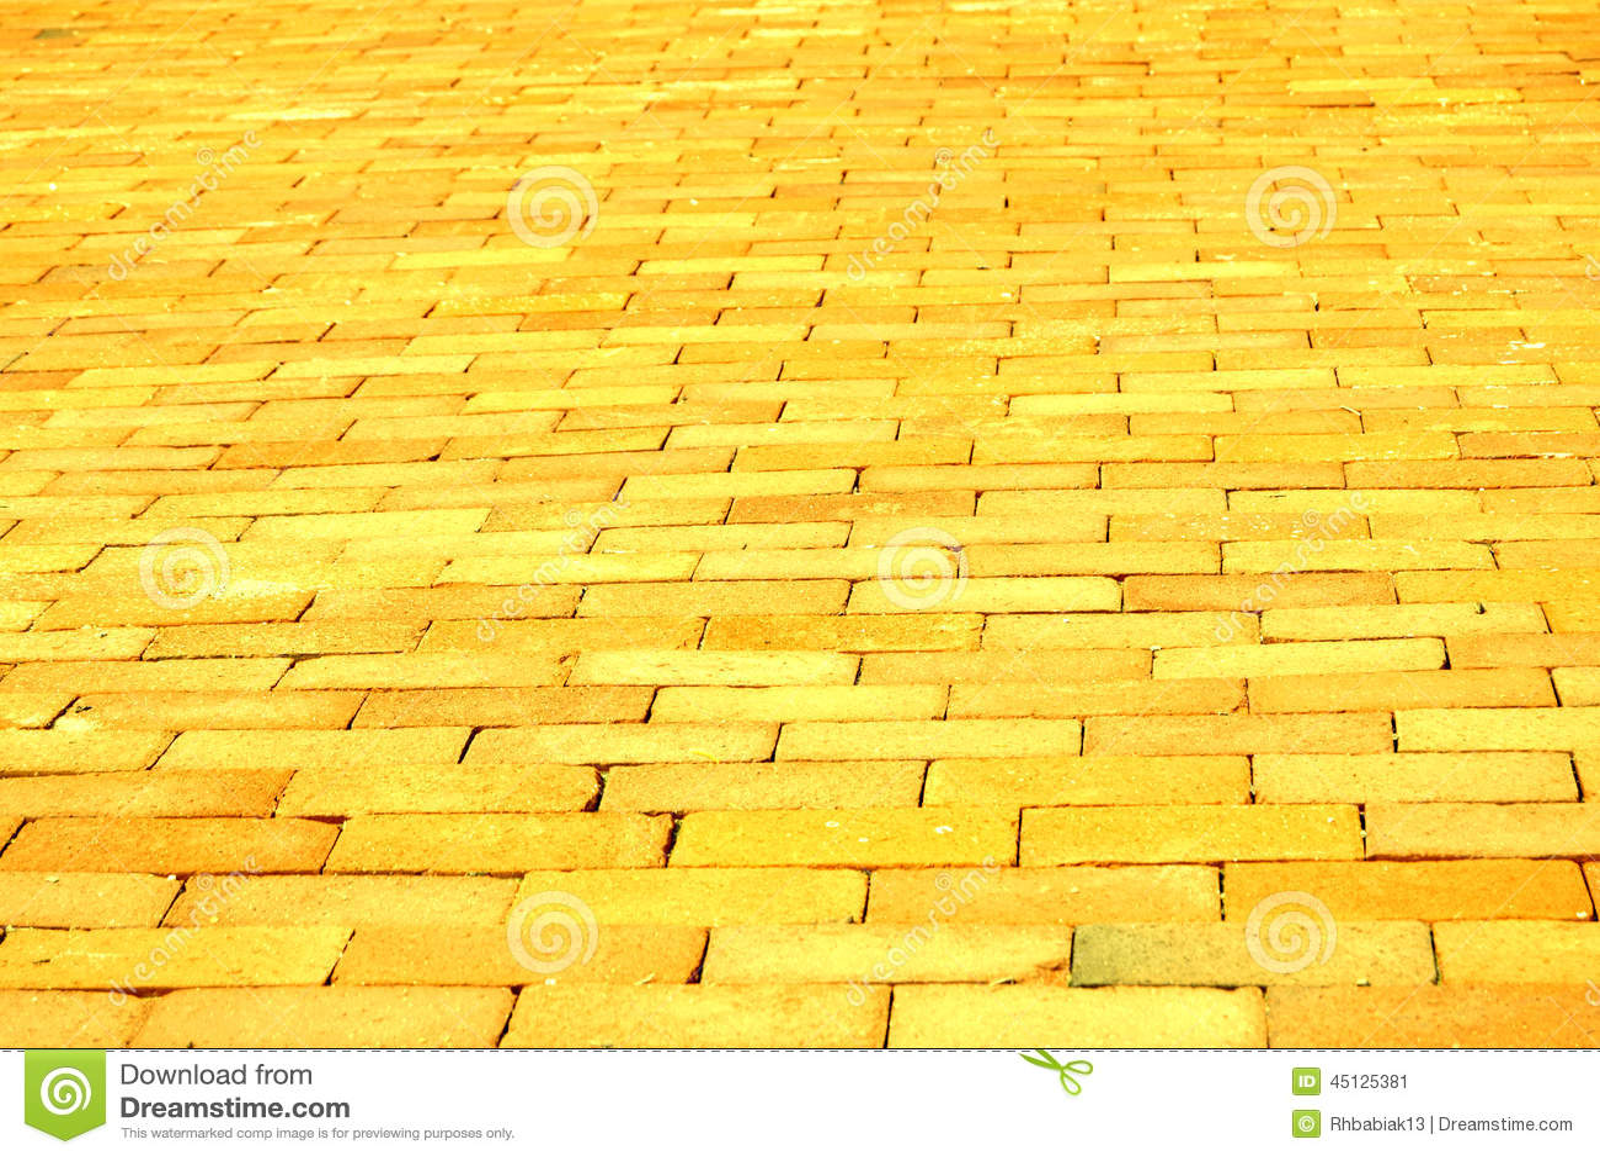 Yellow Brick Road Stoc...